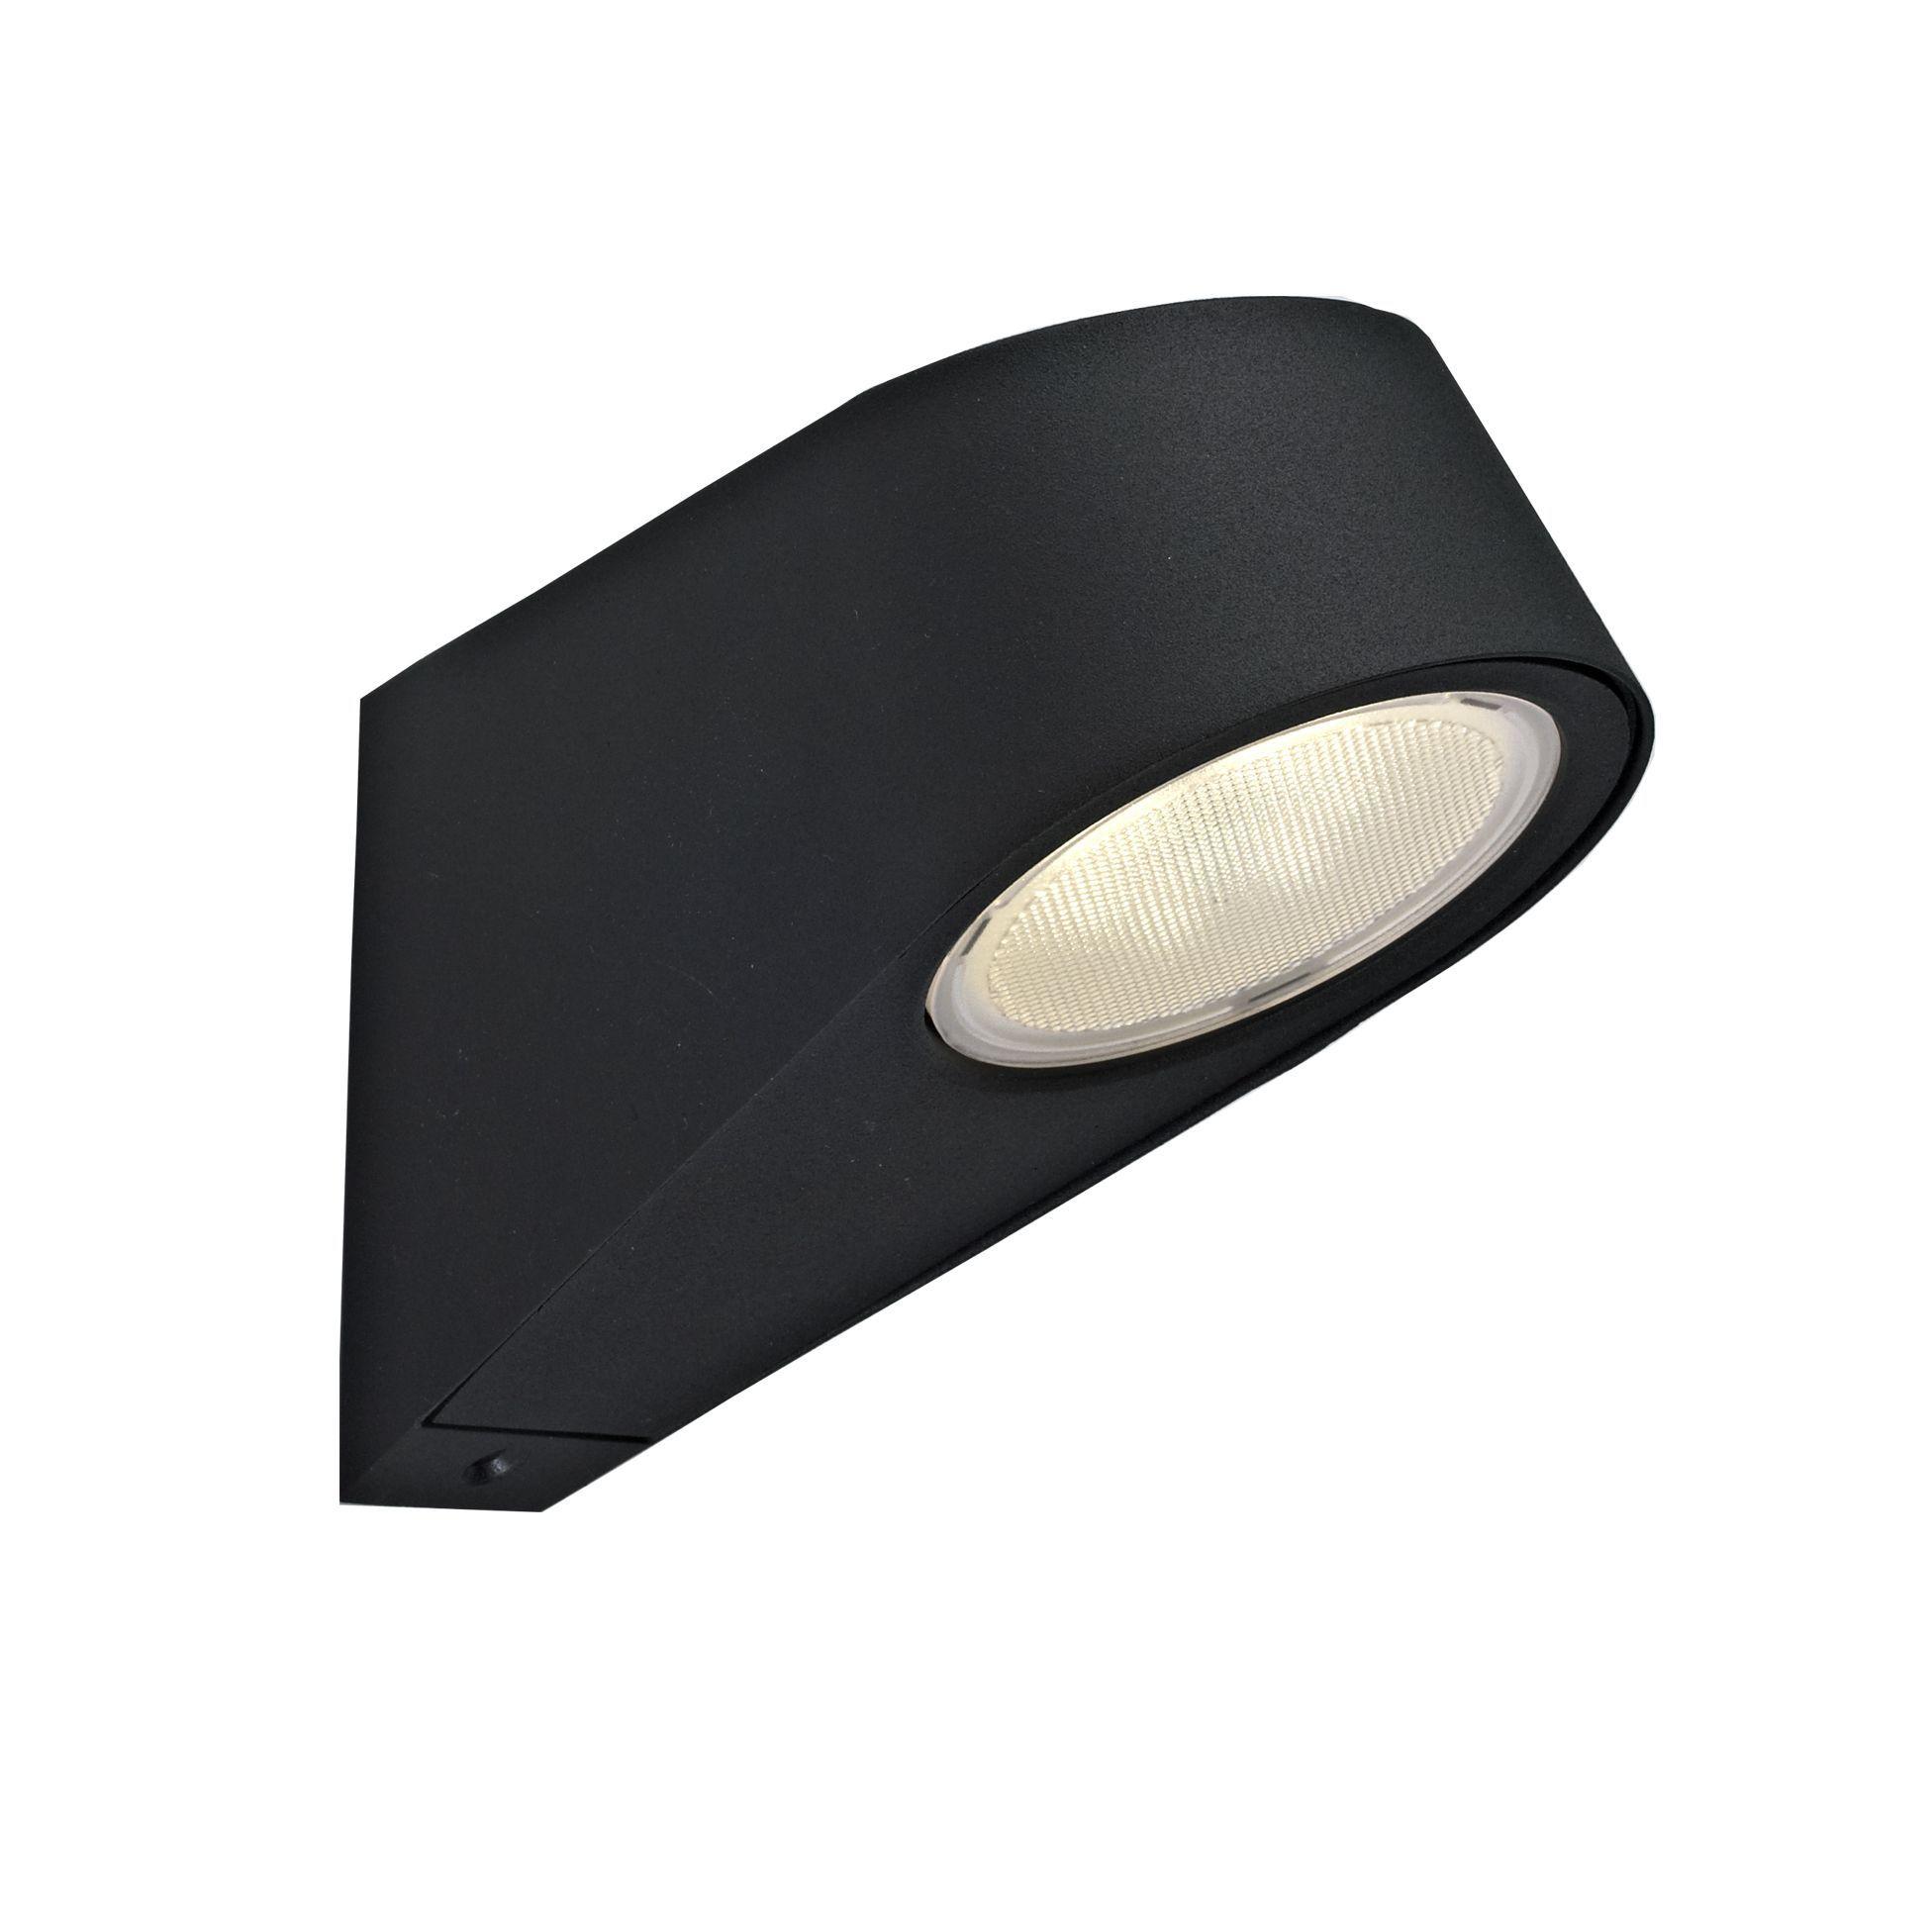 Blooma Santos Black Mains Powered External Wall Light